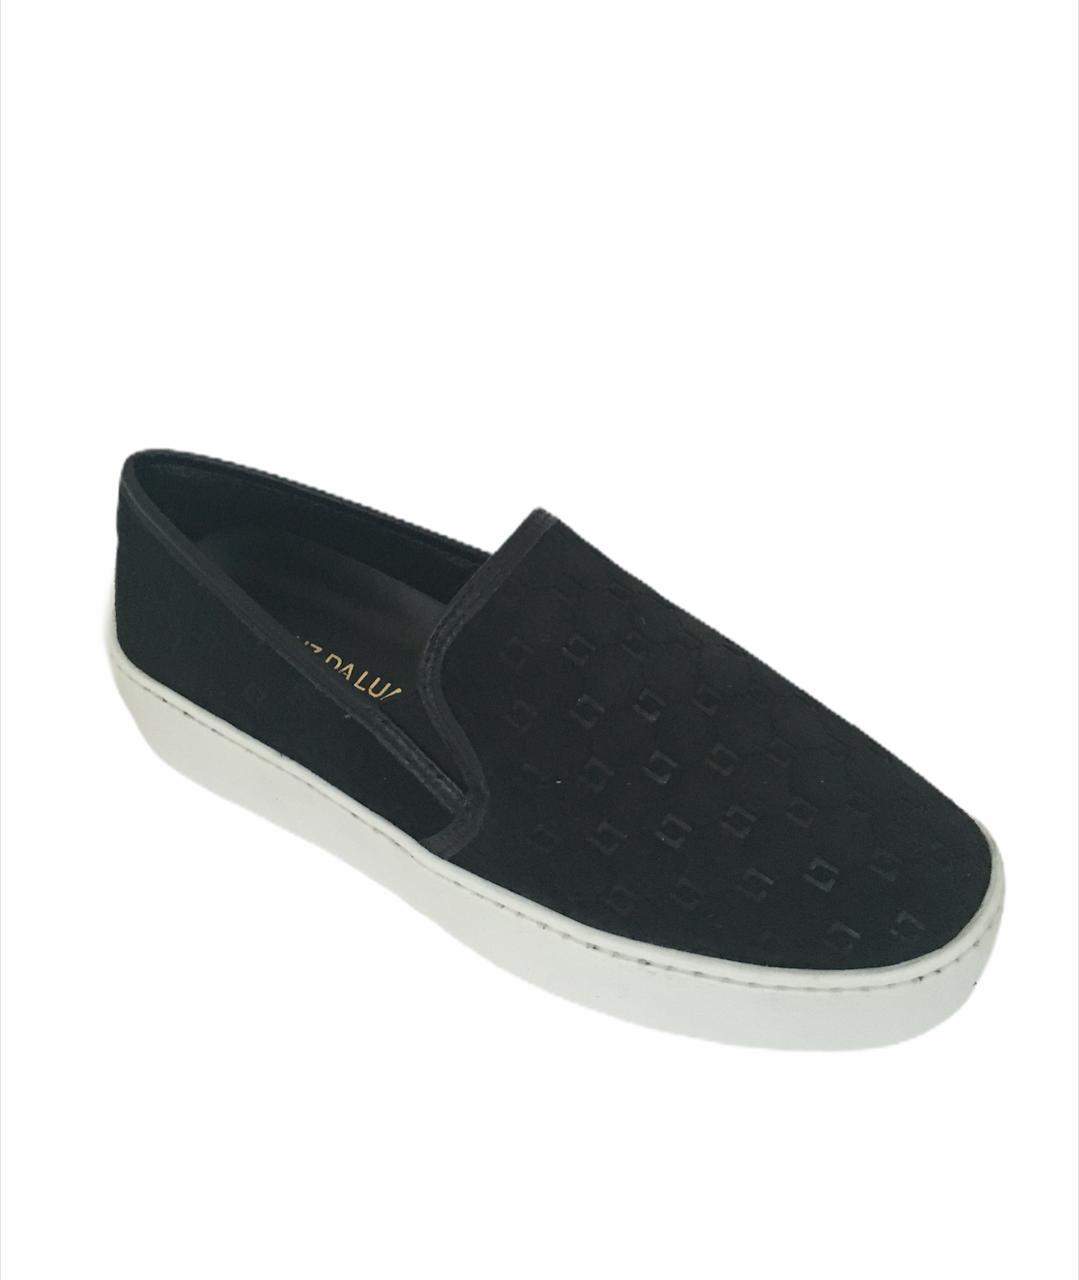 Sapato fechado